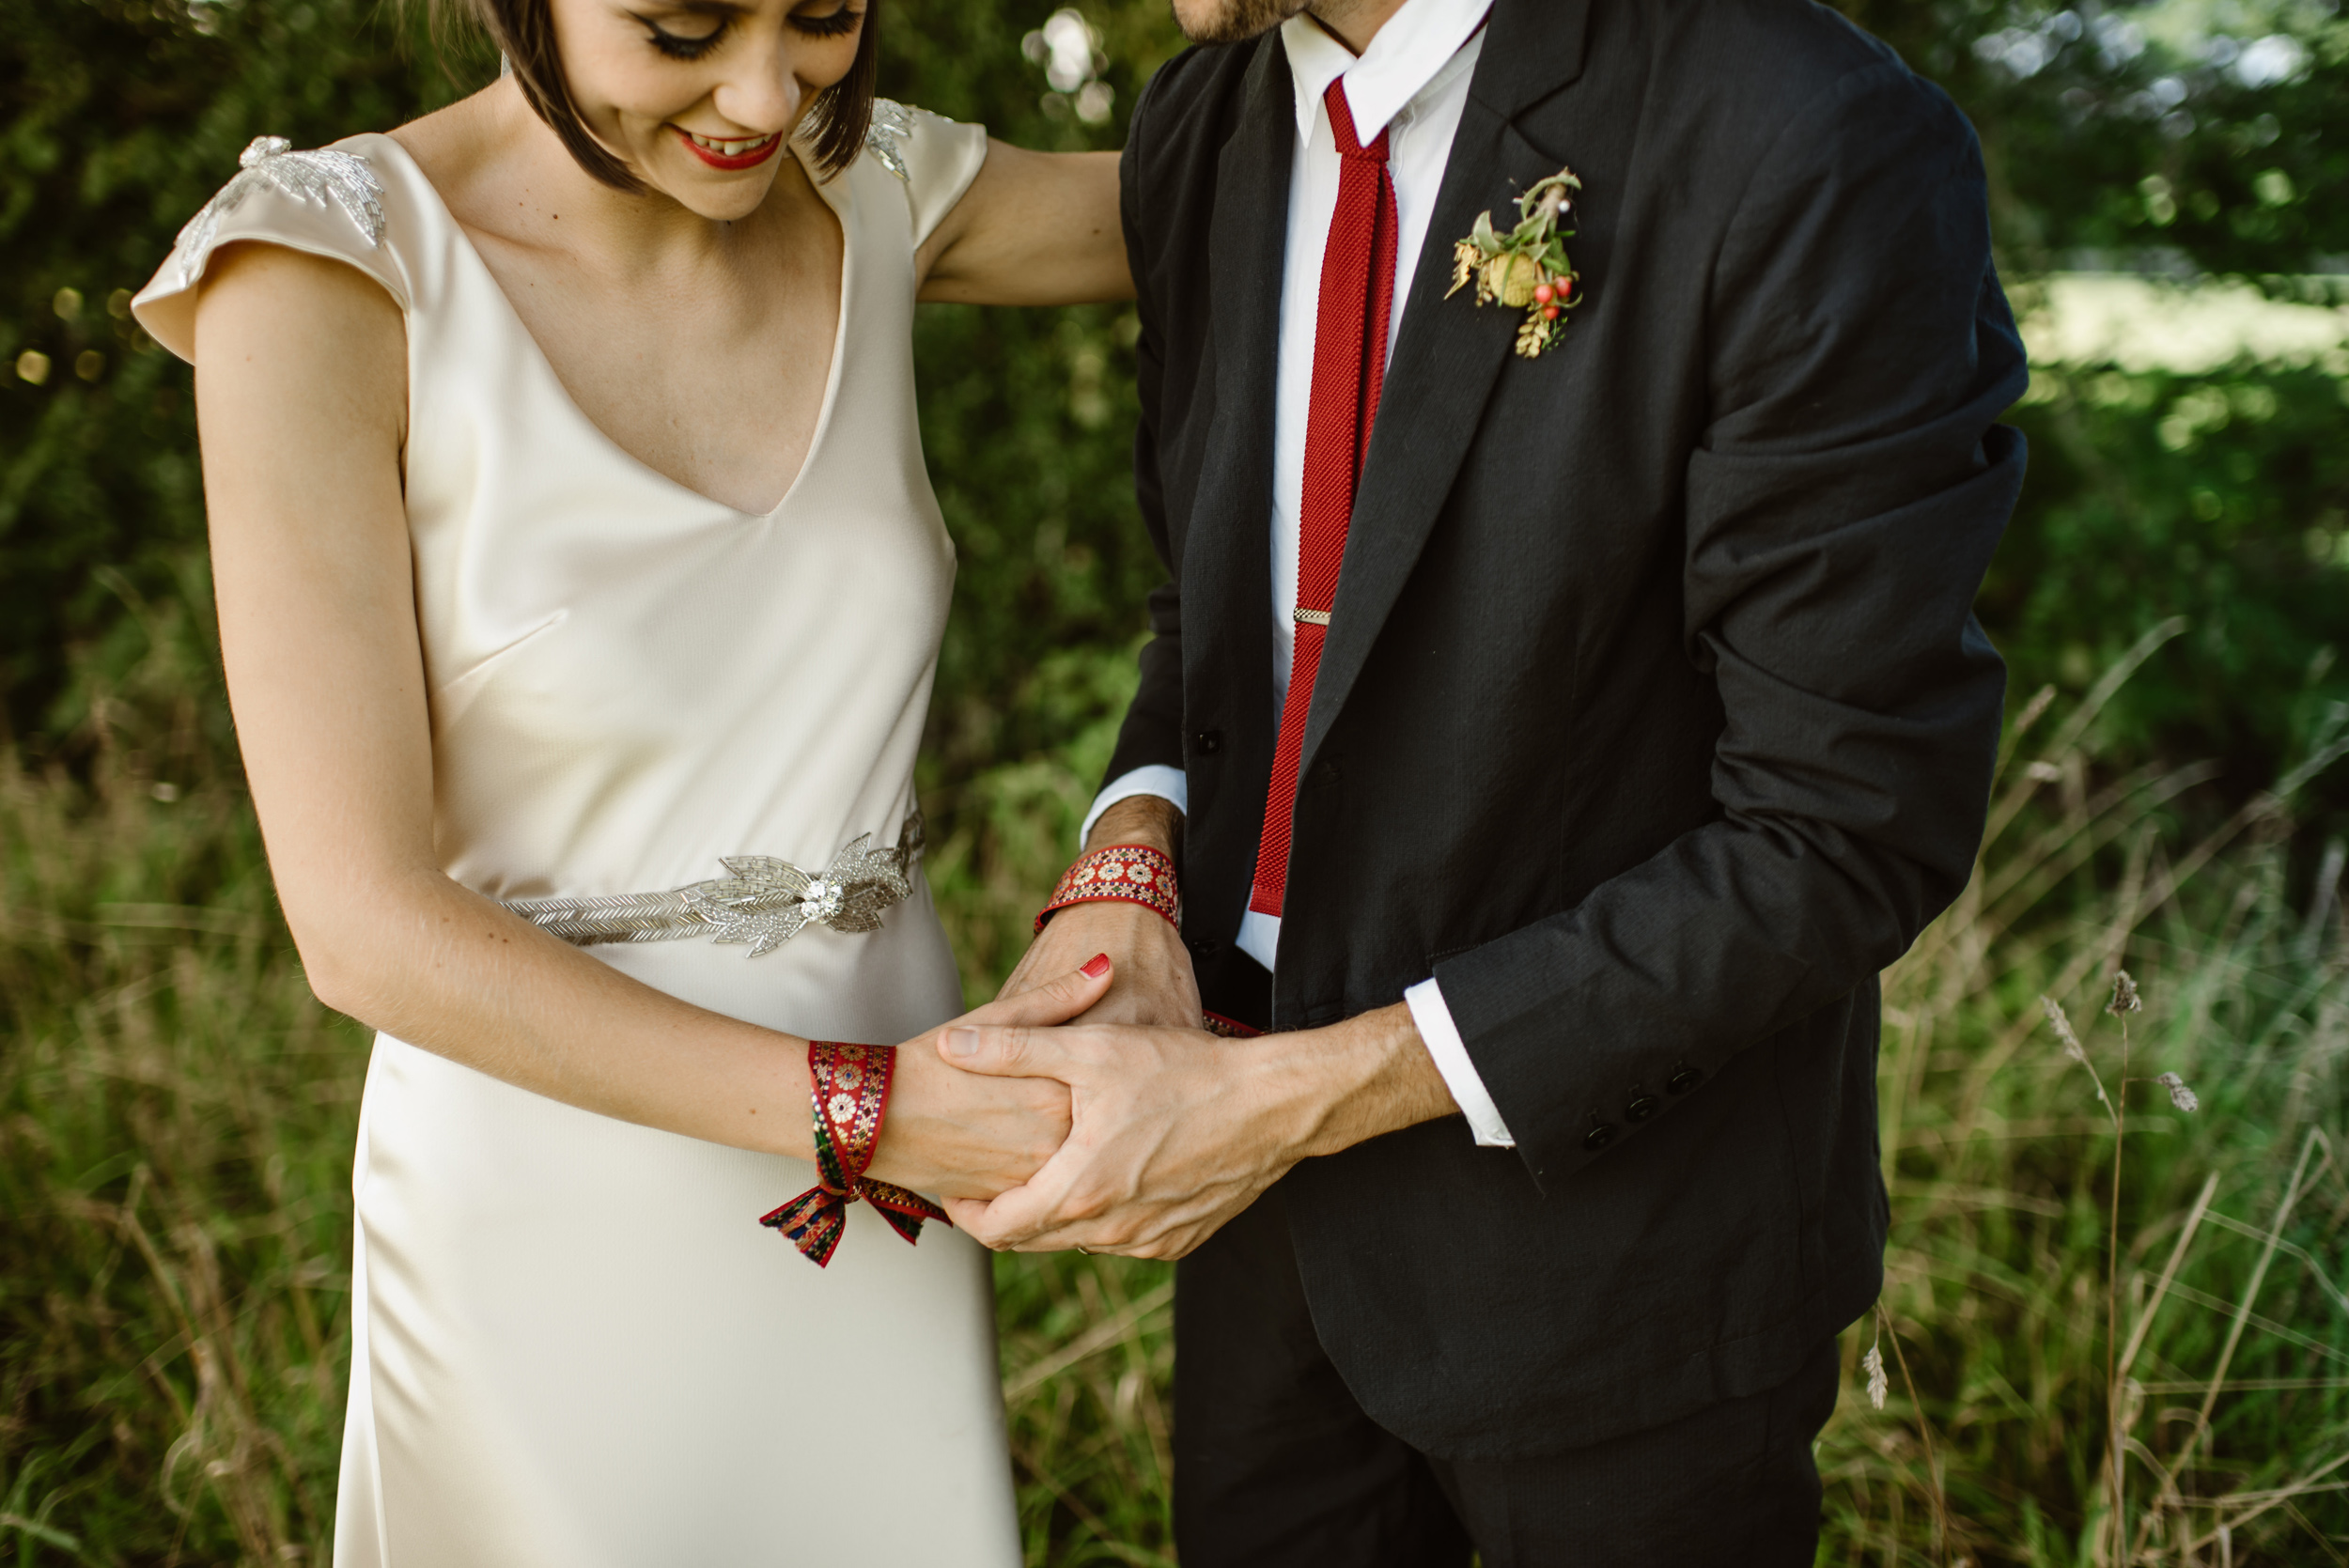 Ro-Kate-Beaumont-bias-cut-silk-wedding-gown-back-garden-wedding-by-Ellie-Gillard-18.jpg